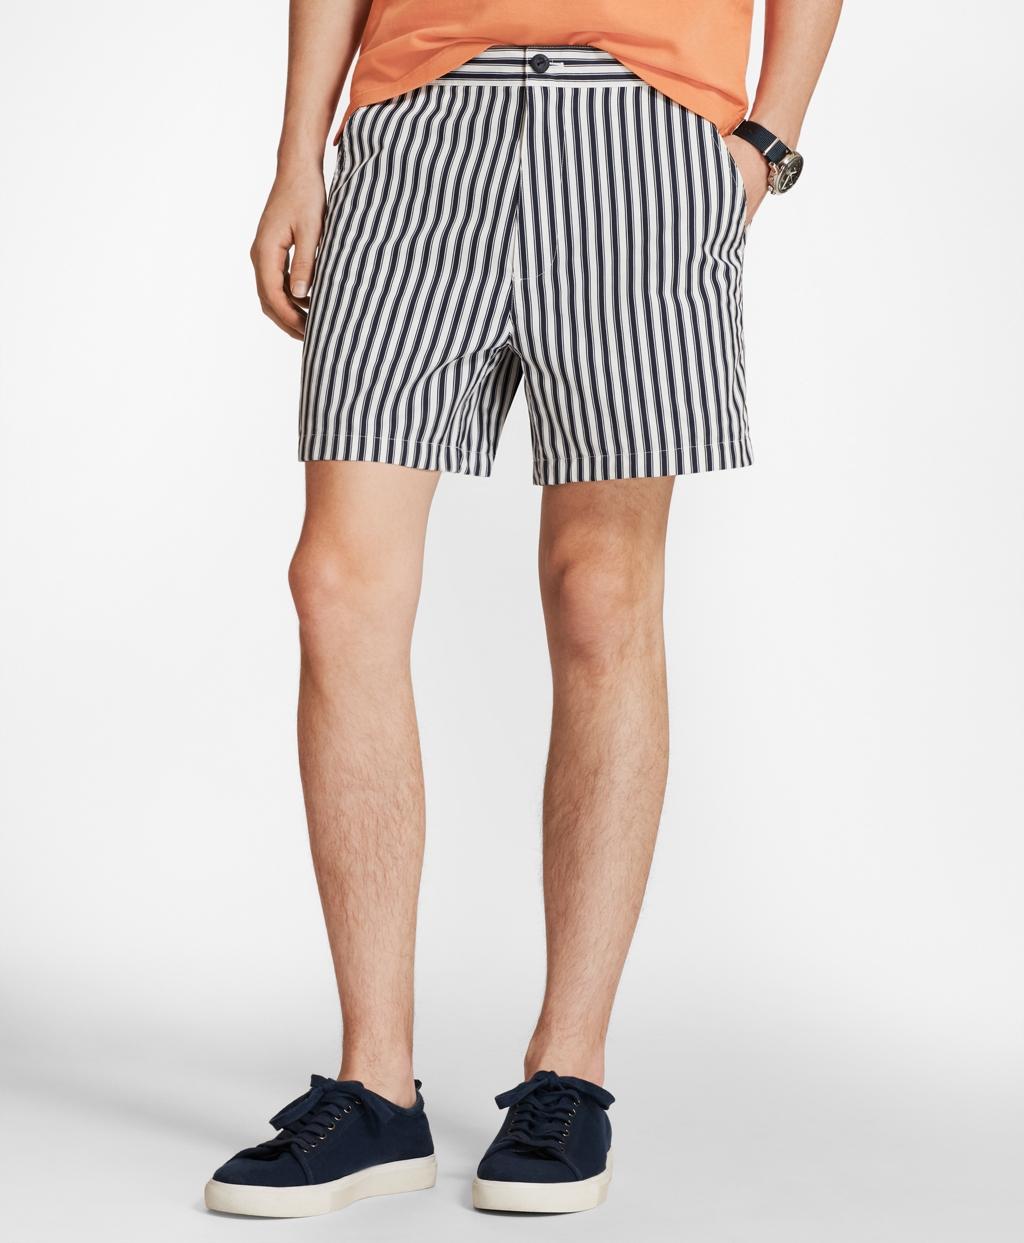 Vintage Men's Swimsuits – 1930s to 1970s History Brooks Brothers Mens Retro-Fit 4 Striped Swim Trunks $59.50 AT vintagedancer.com